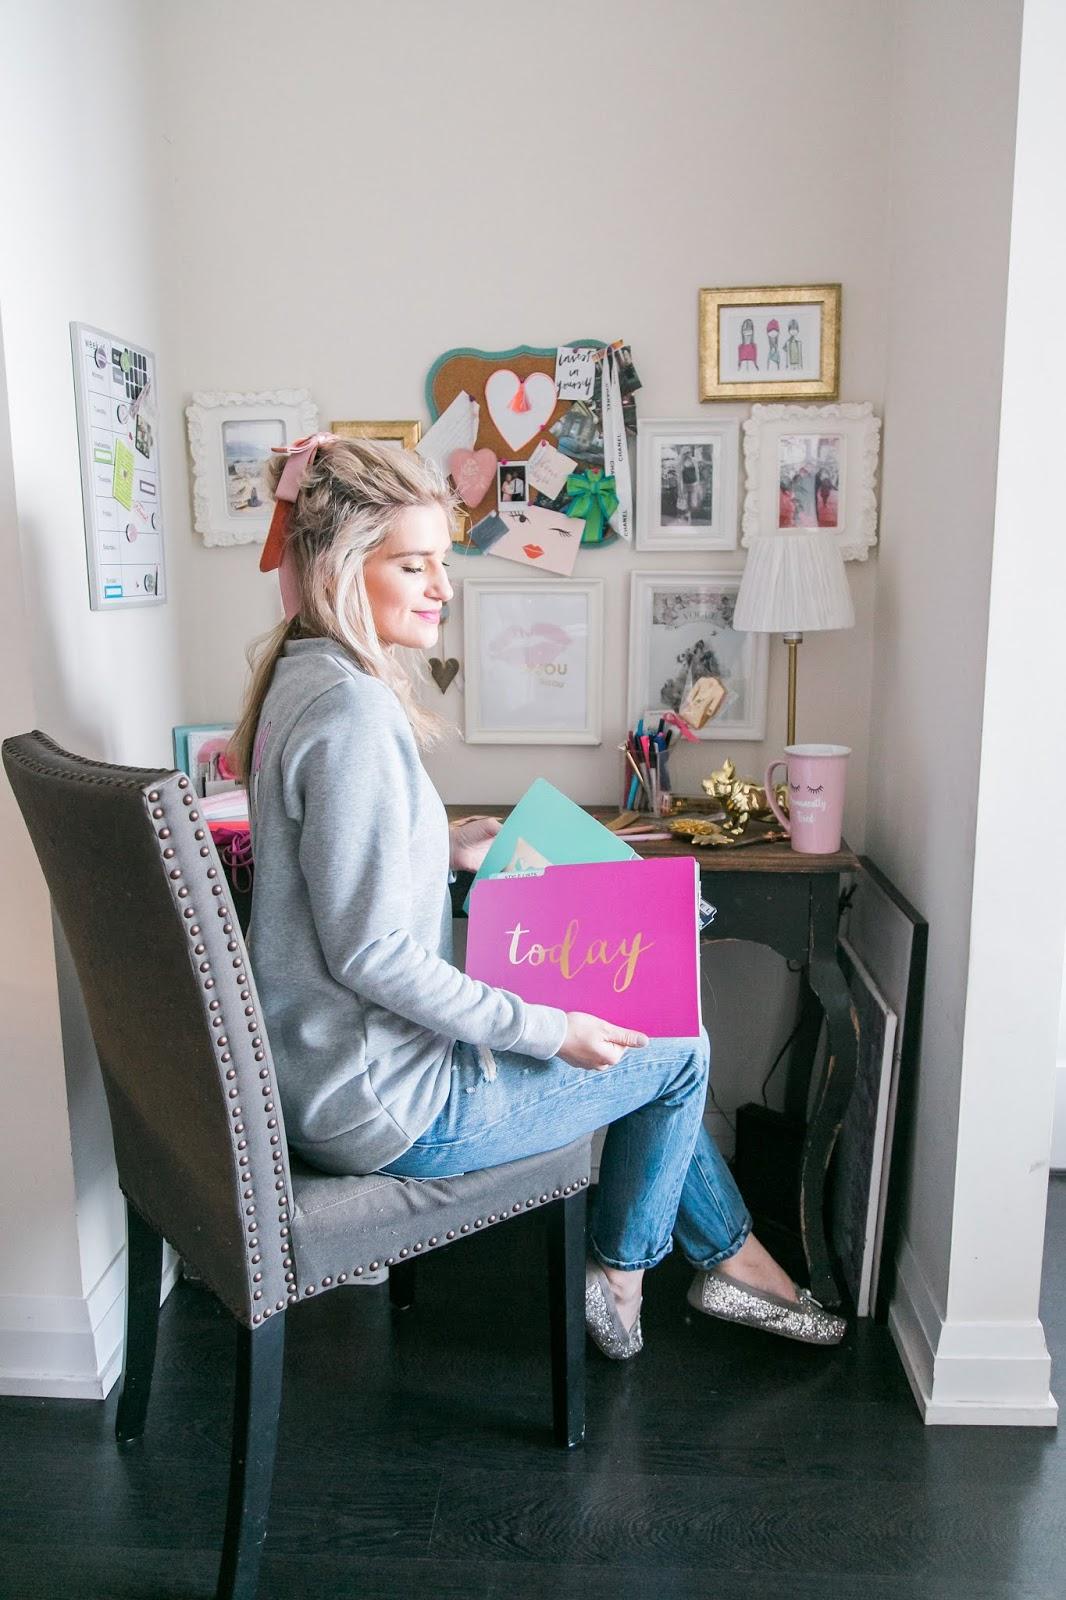 Bijuleni - 5 Cheap Ways to Make Your Desk Area Look Pretty